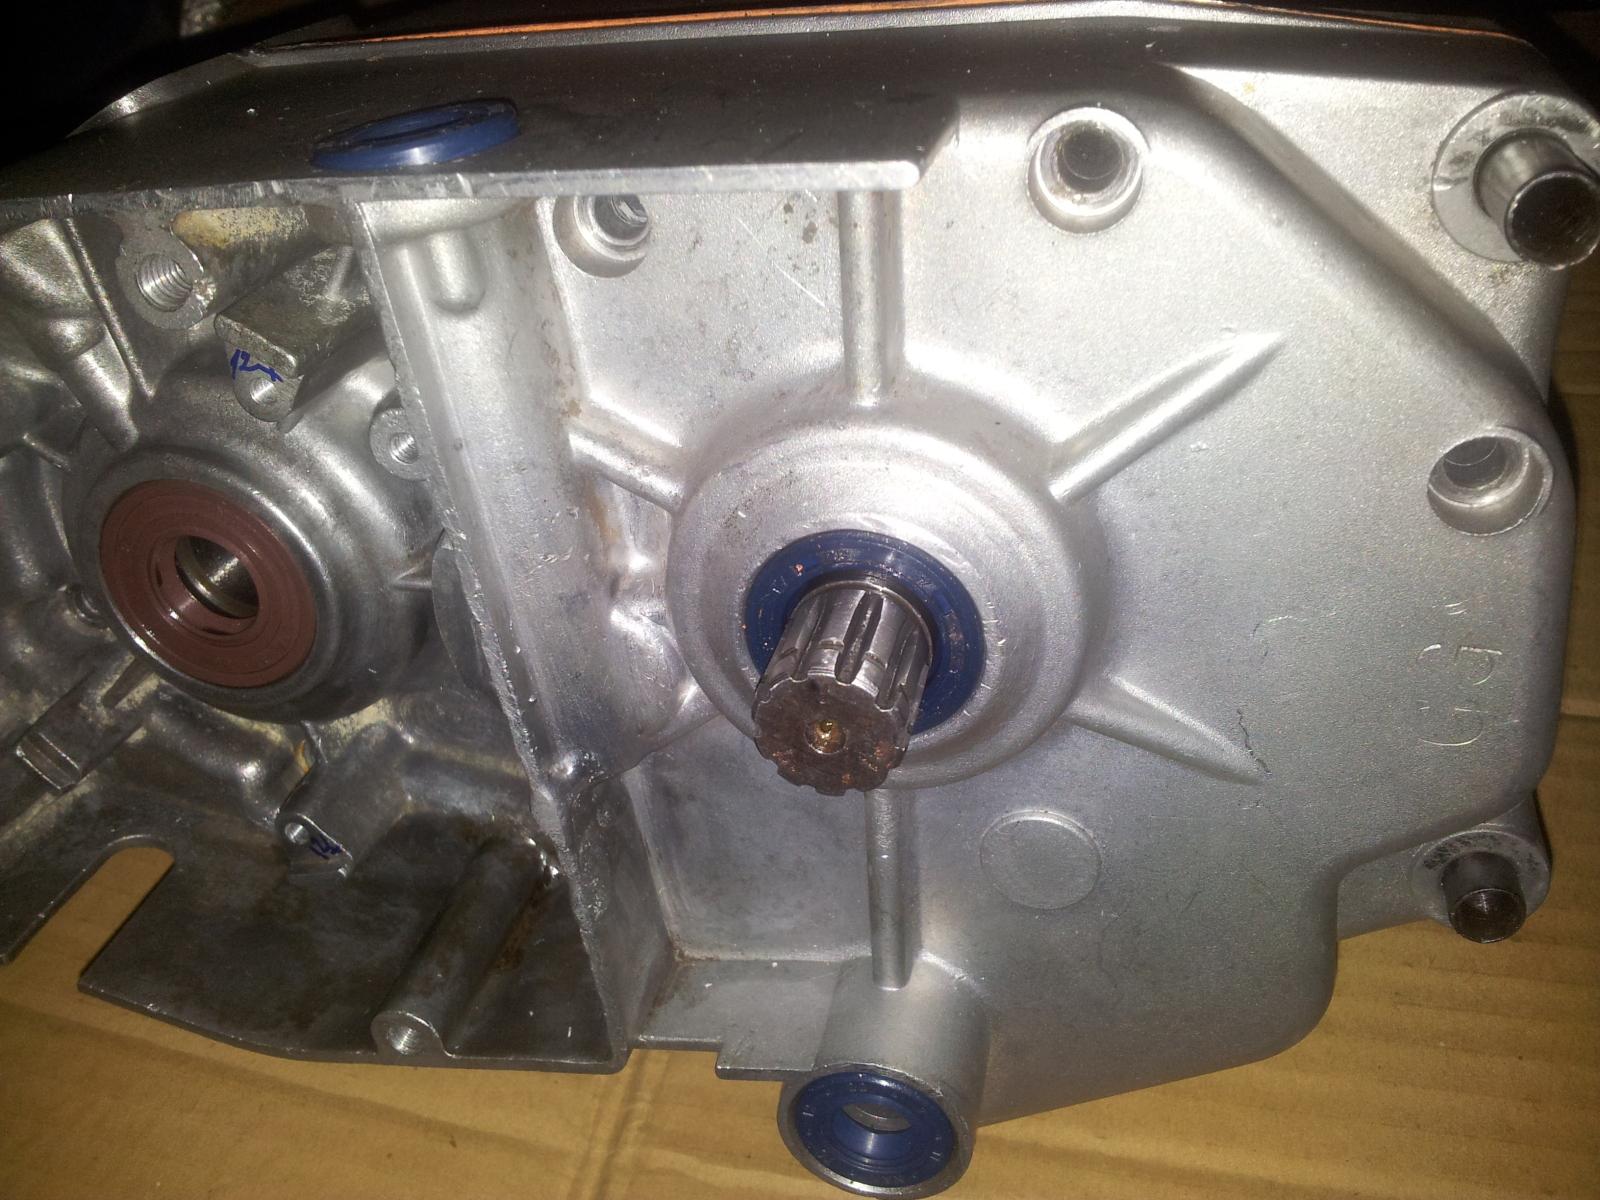 encendido - Mejoras en motores P3 P4 RV4 DL P6 K6... - Página 5 W8l45i